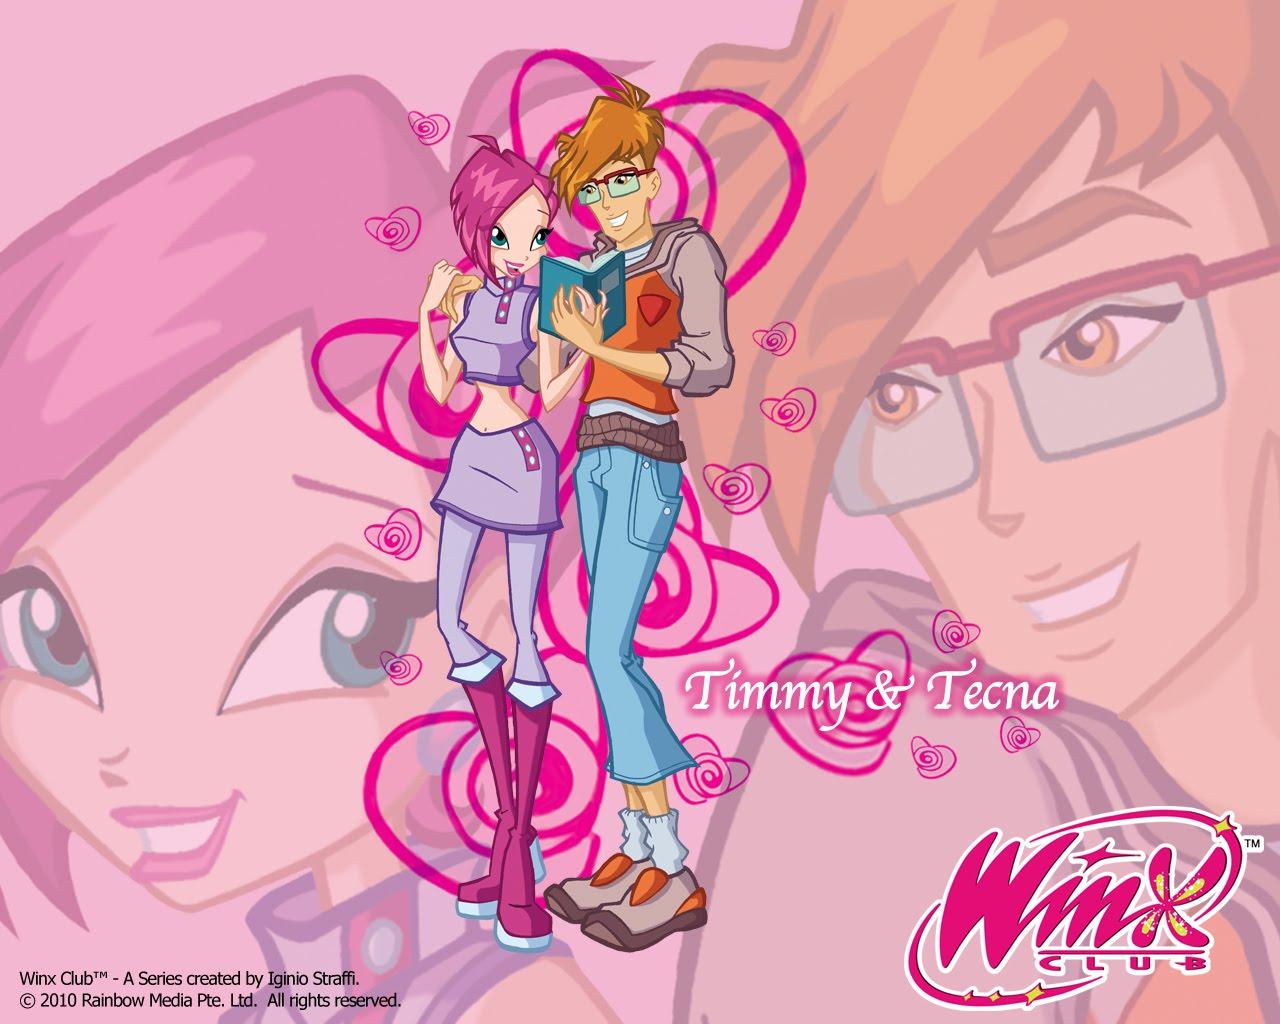 http://winxclub.trikky.ru/wp-content/uploads/2010/08/Love1_TecnaTimmy_1280x1024.jpg